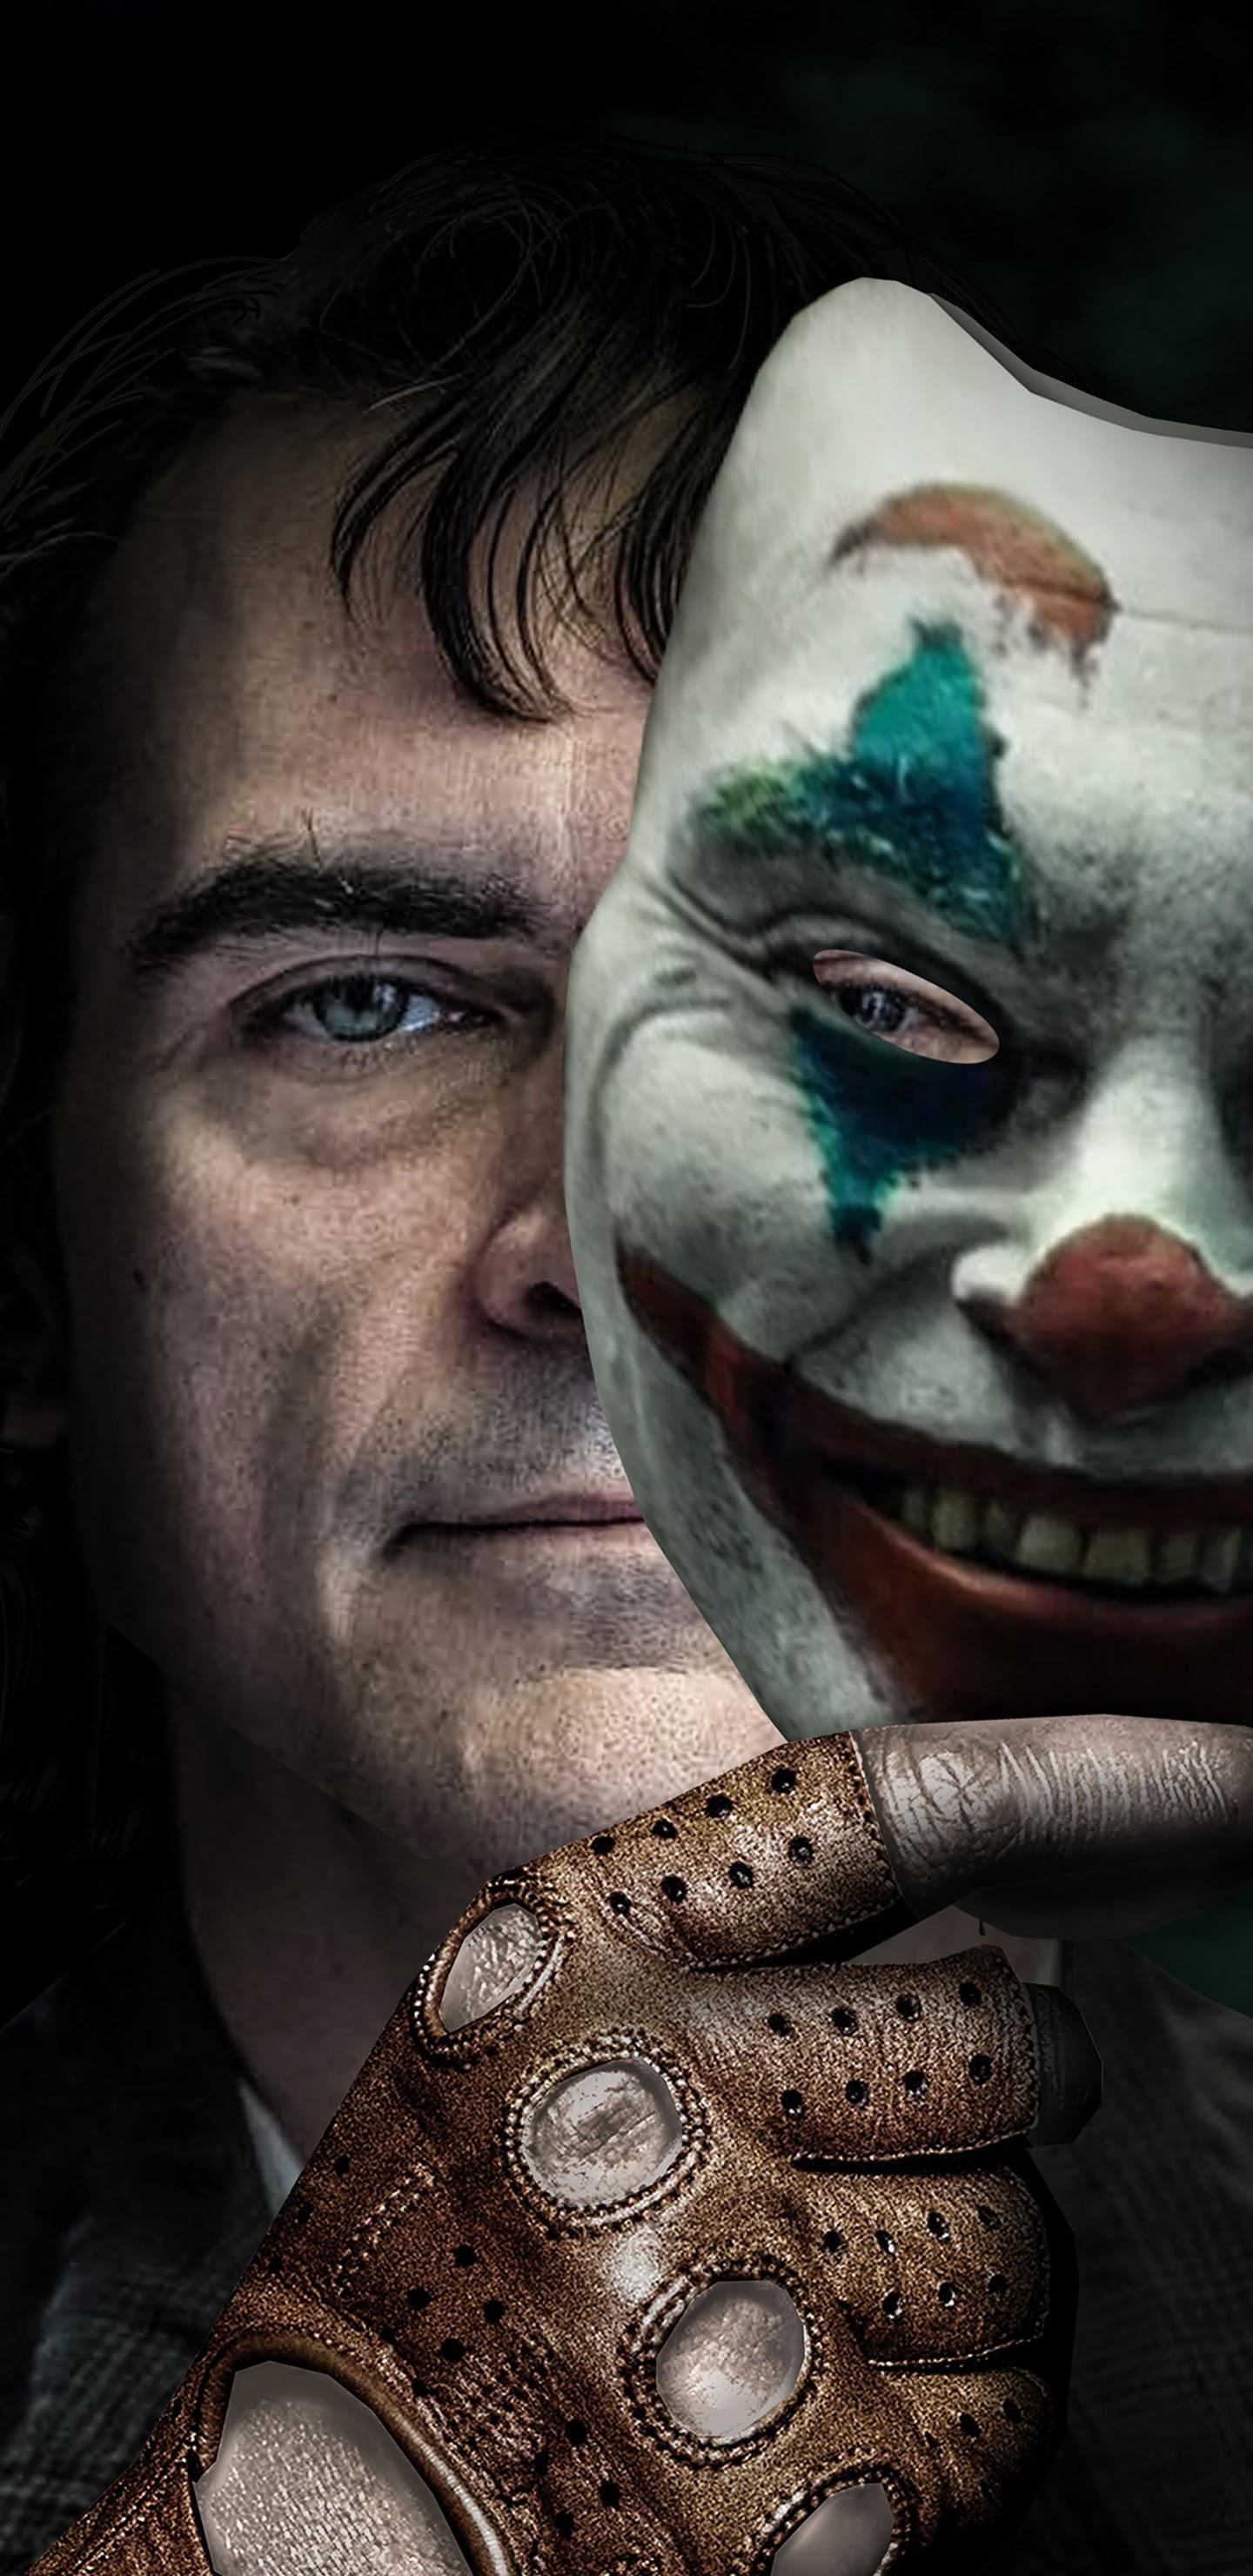 Joker 2019 Joaquin Phoenix 4k Wallpaper 11